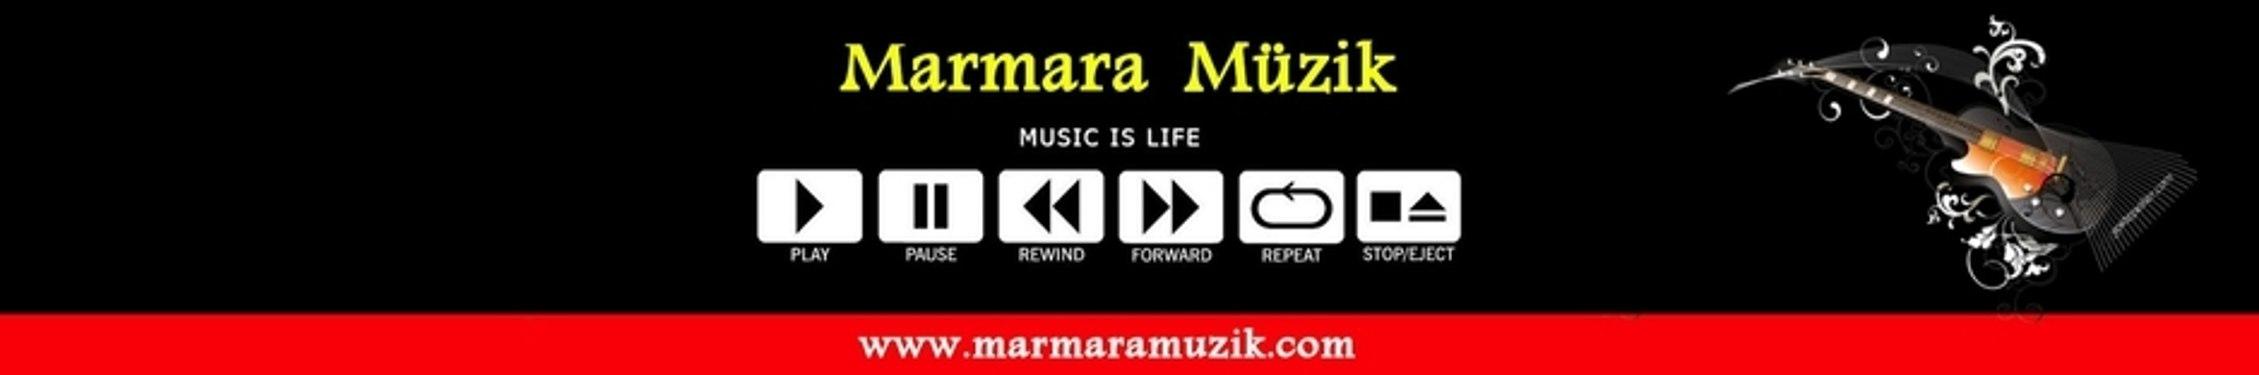 Marmara Müzik